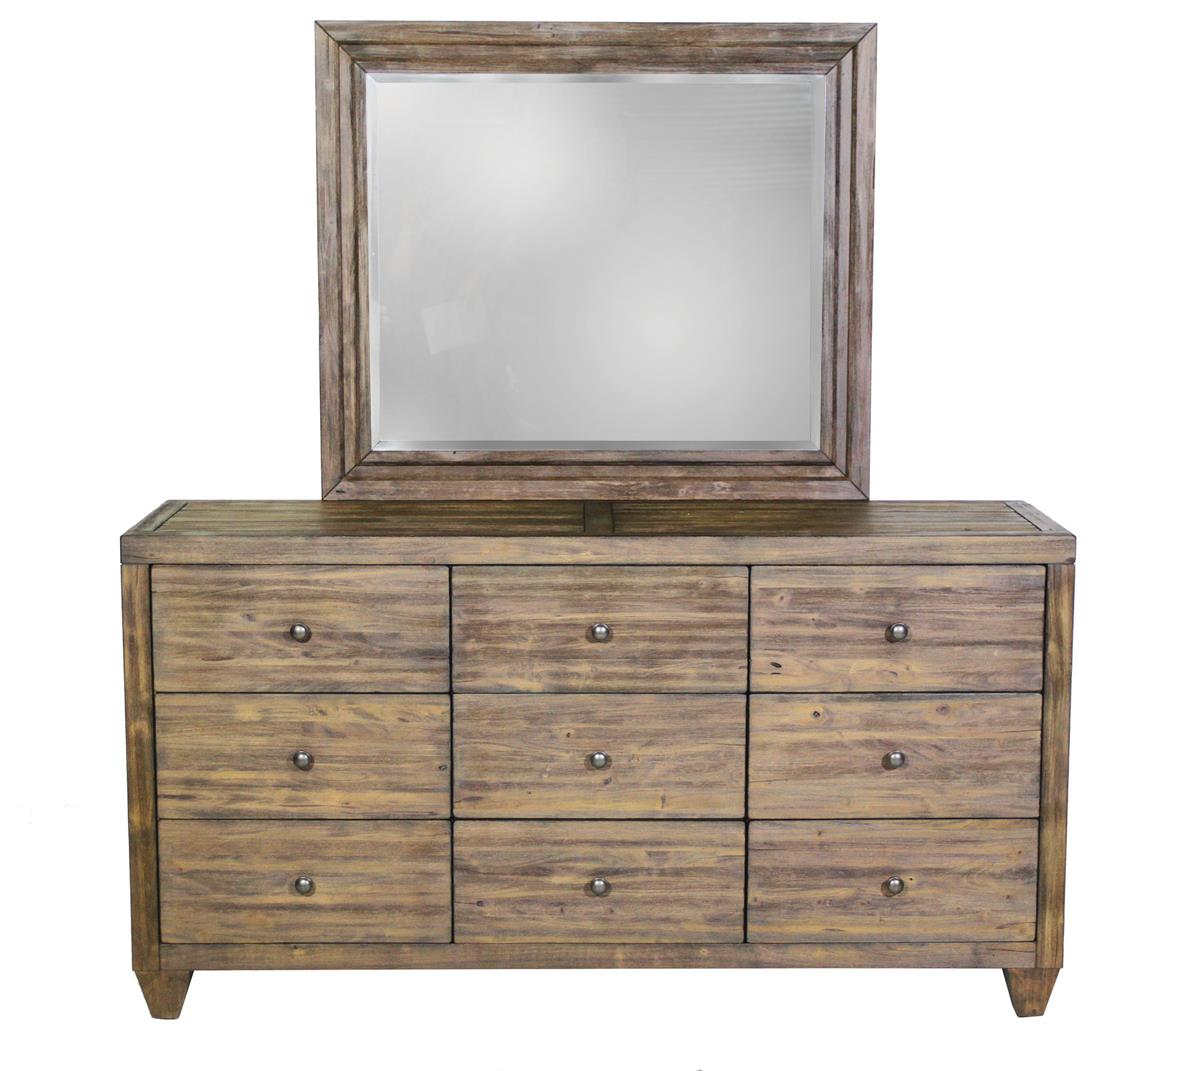 Modus International Corinth 9 Drawer Dresser - Item Number: 7W 80 82 Cornith